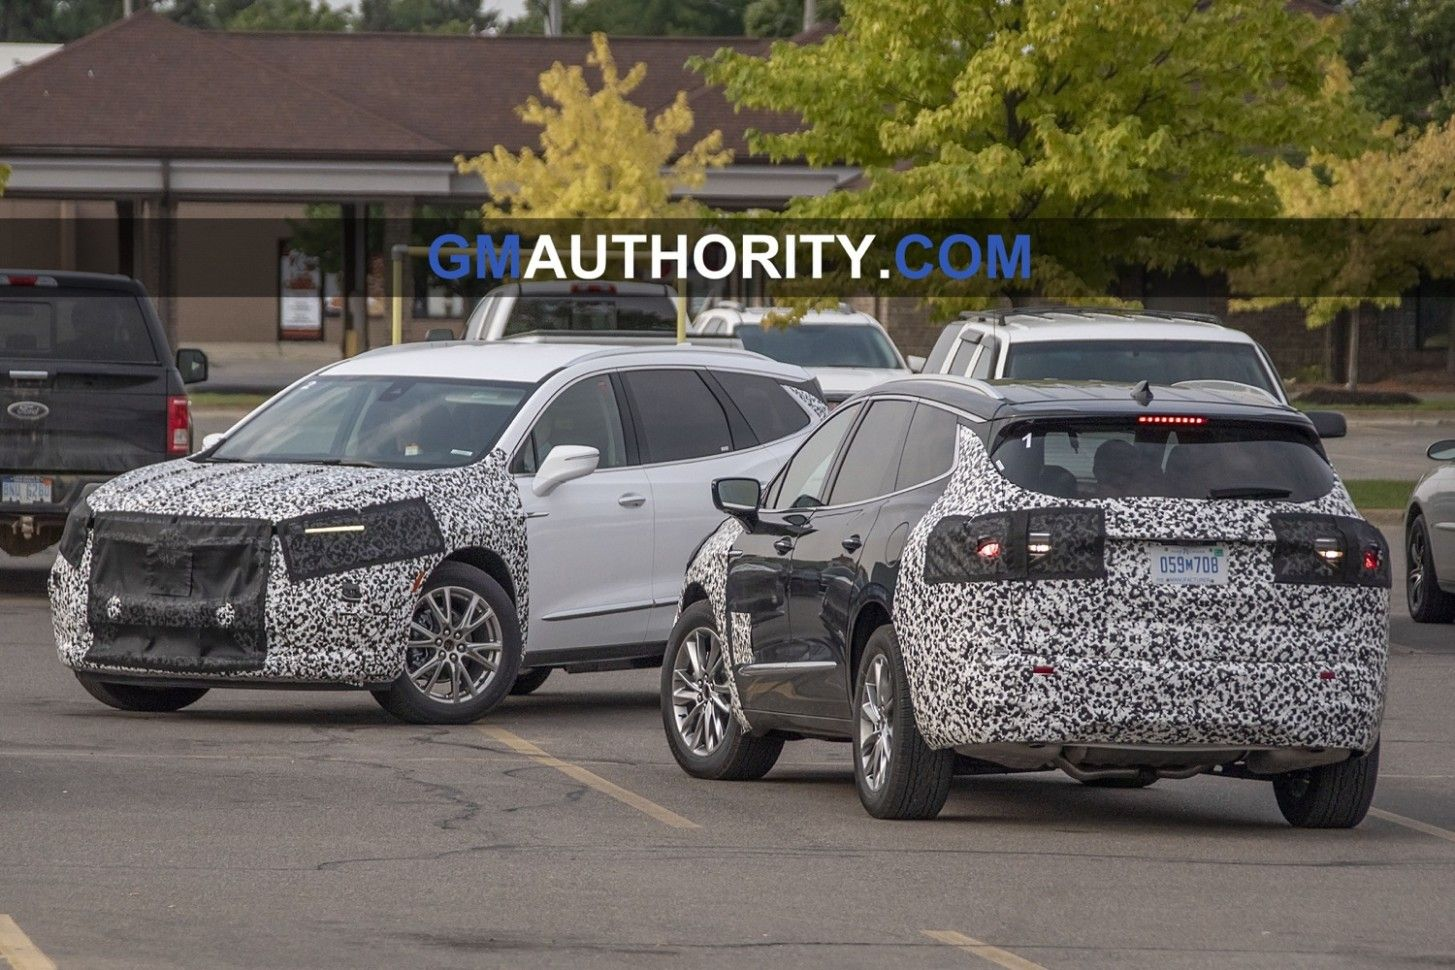 3 Buick Enclave Spy Photos Exterior  Buick enclave, Buick